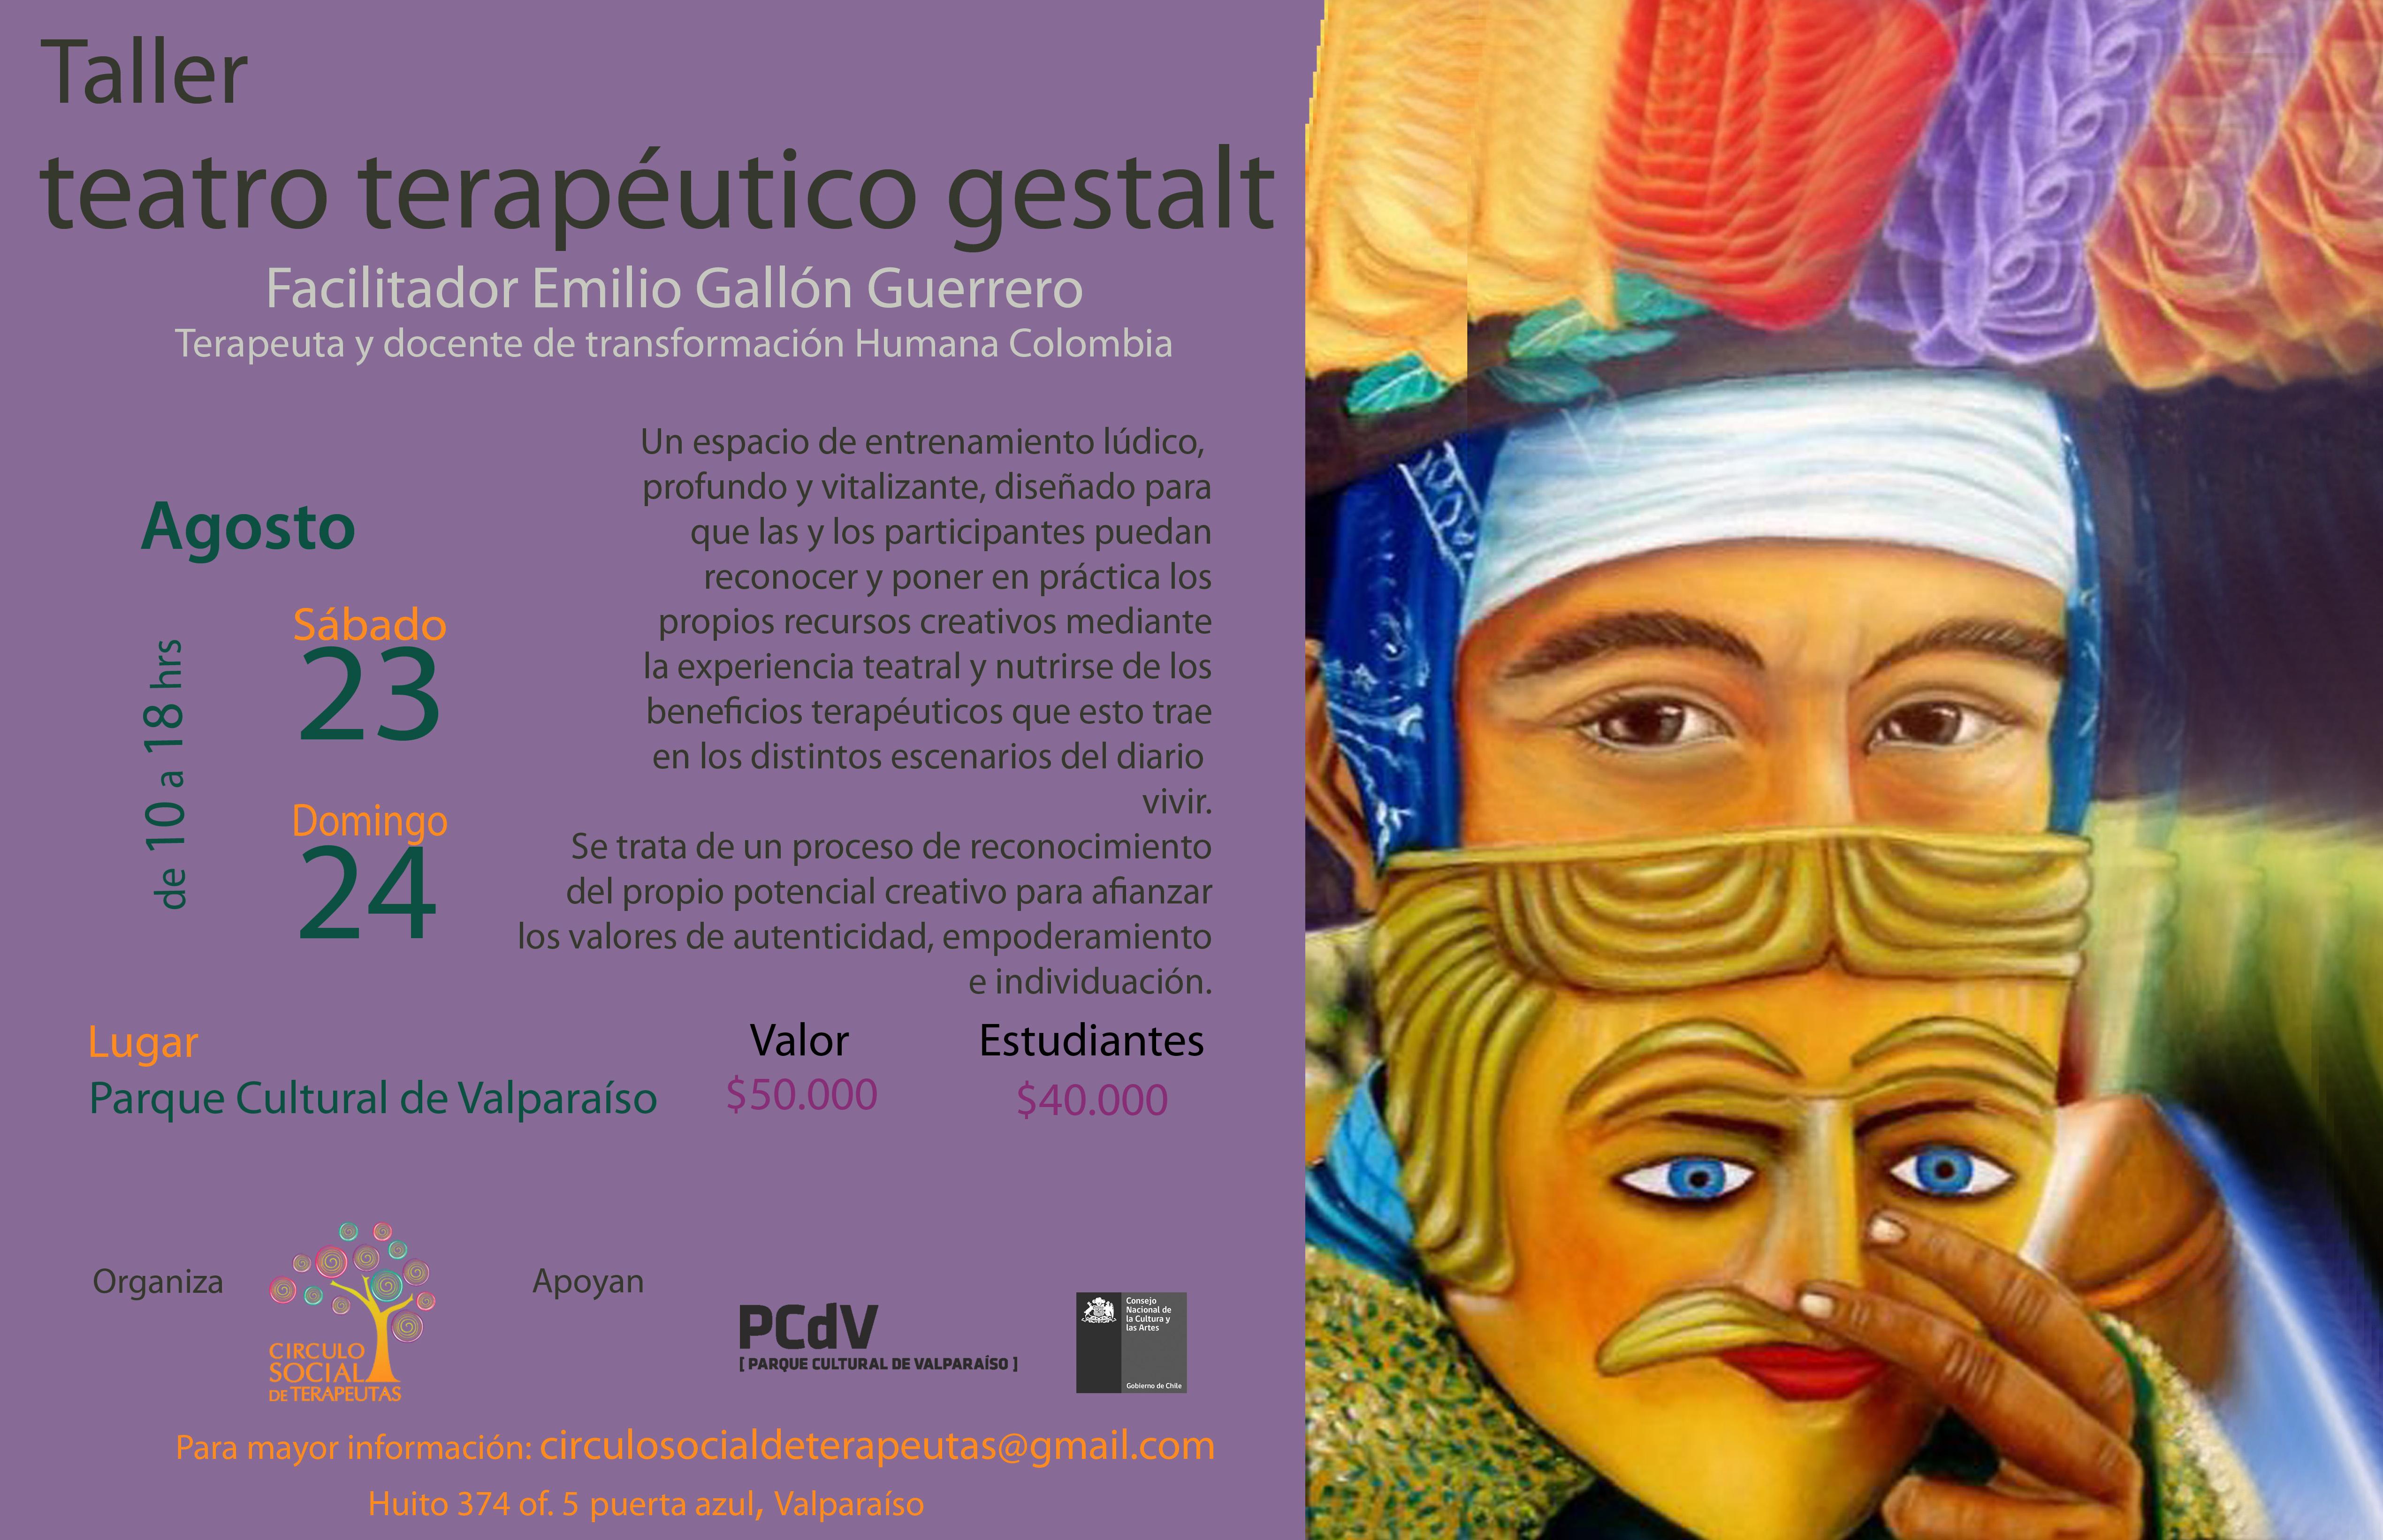 Taller Teatro Teparpéutico Gestalt (1)